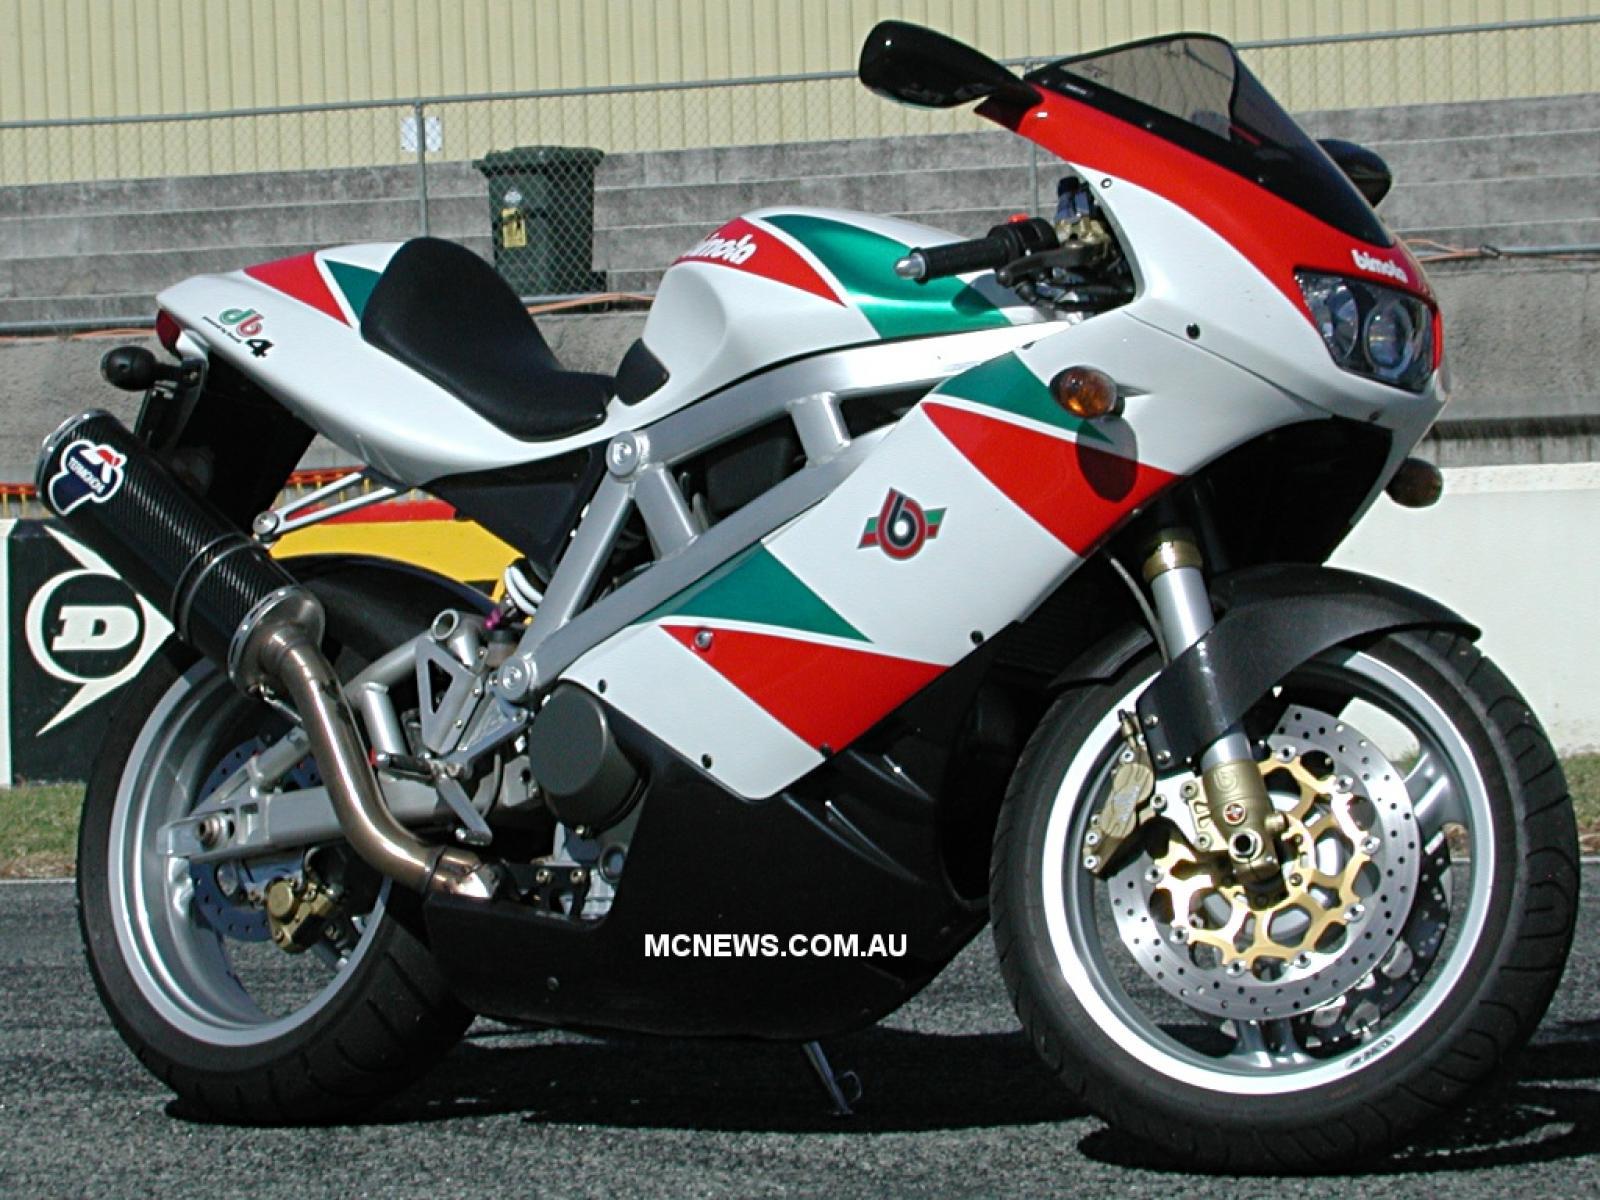 Bimota DB5S Borsalino Limited Edition